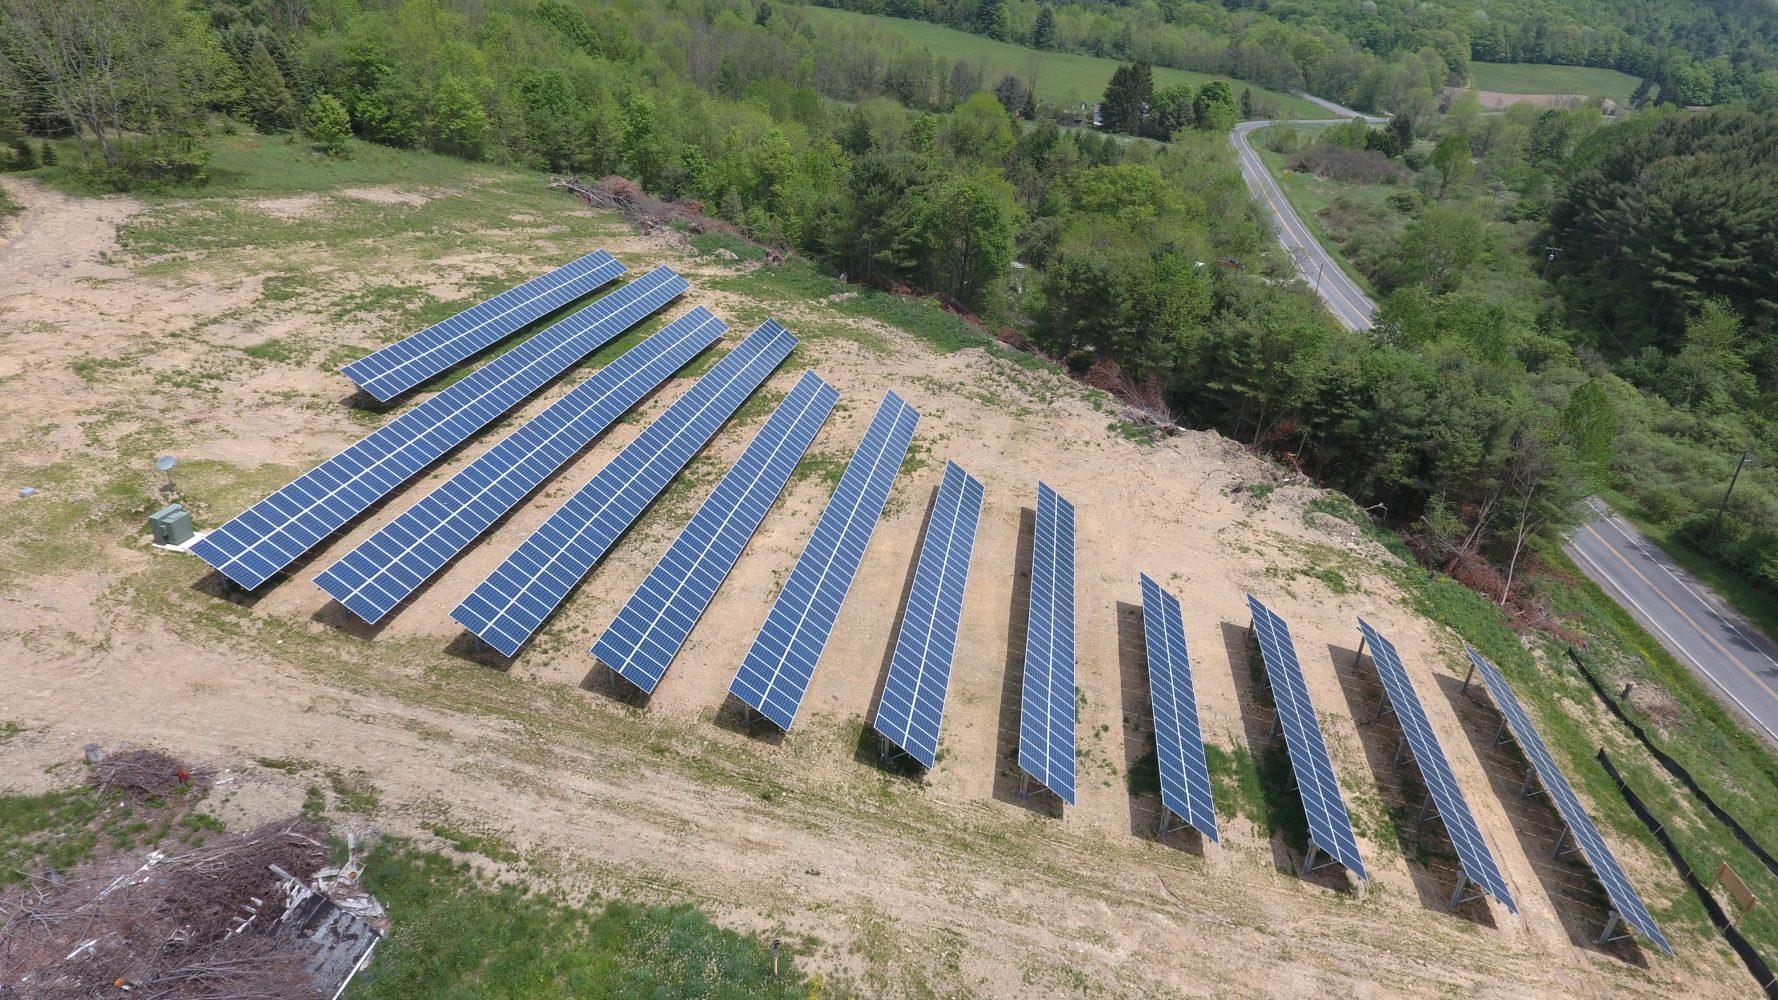 Community solar farm built by Renovus Solar manufacturing